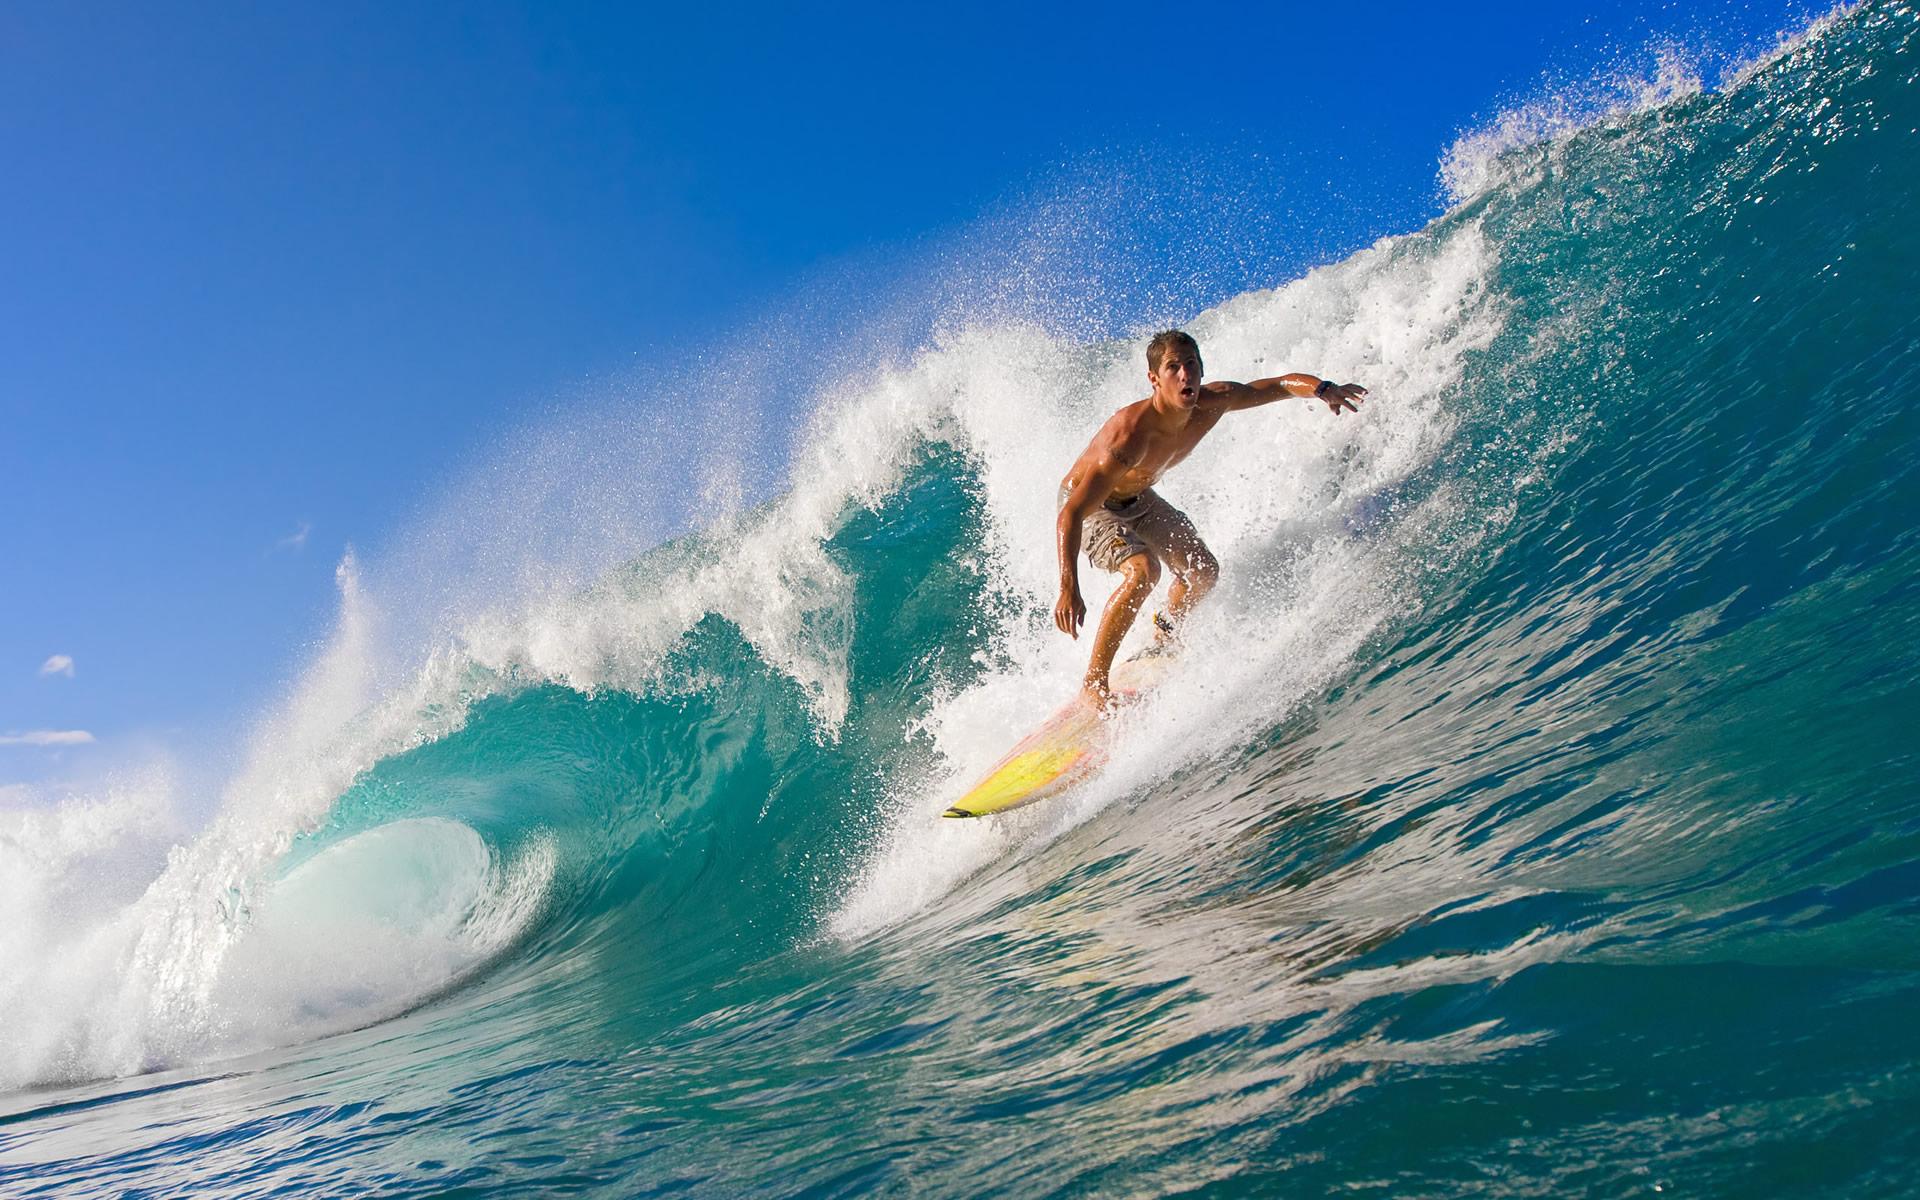 Surfing Summer Wallpaper HD wallpapers - Surfing Summer Wallpaper